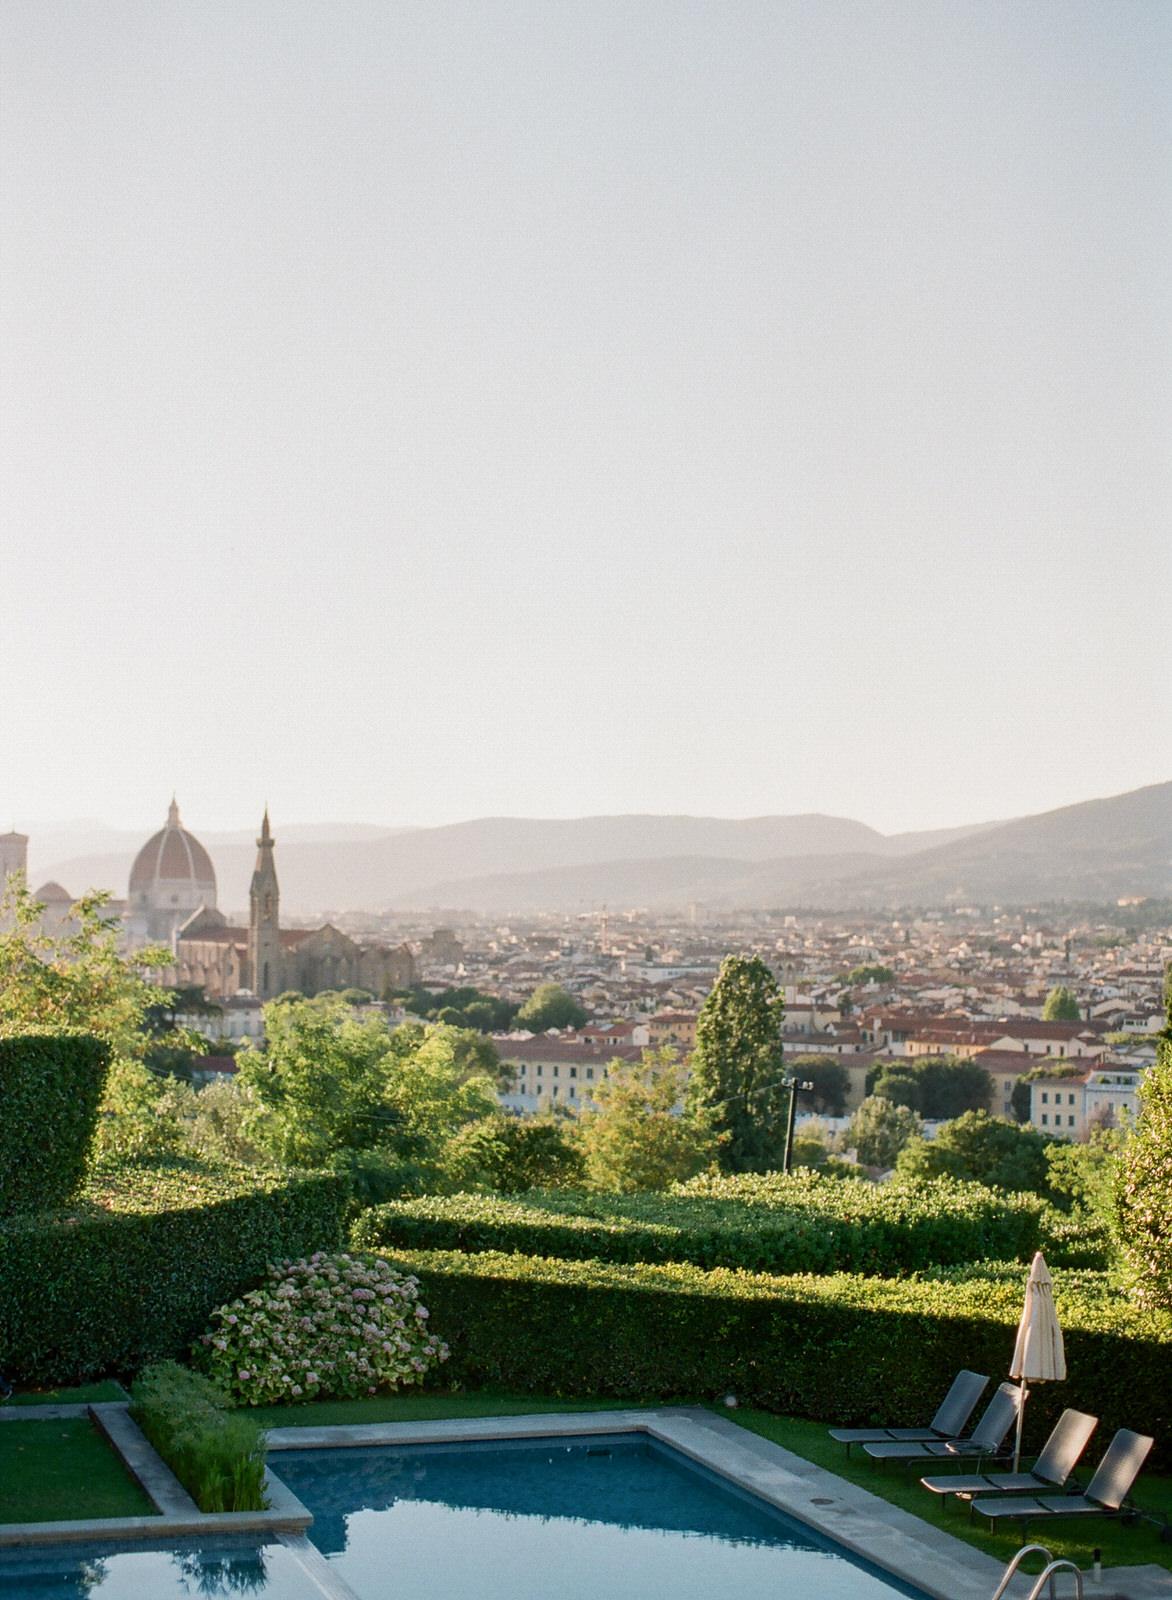 artiese-florence-tuscany-italy-destination-wedding-photographer-000070390024